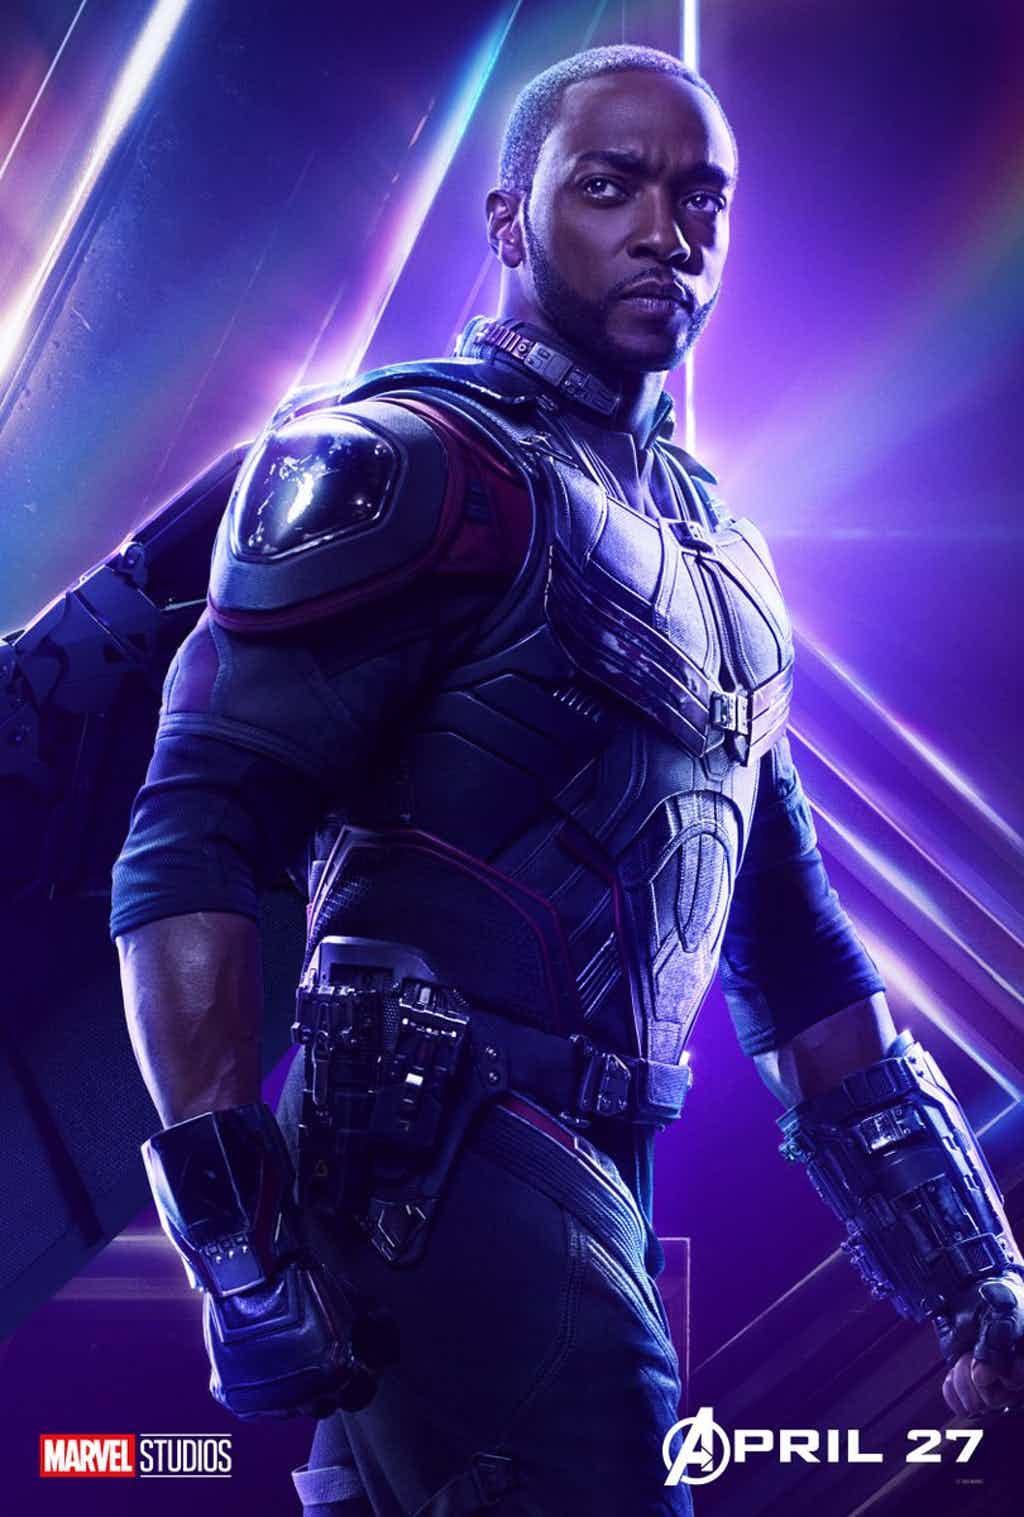 szmk_marvel_infinity_war_vegtelen_haboru_bosszuallok_avengers_ironman_hulk_thor_captainamaerica_guardians_galaxy_5.jpg